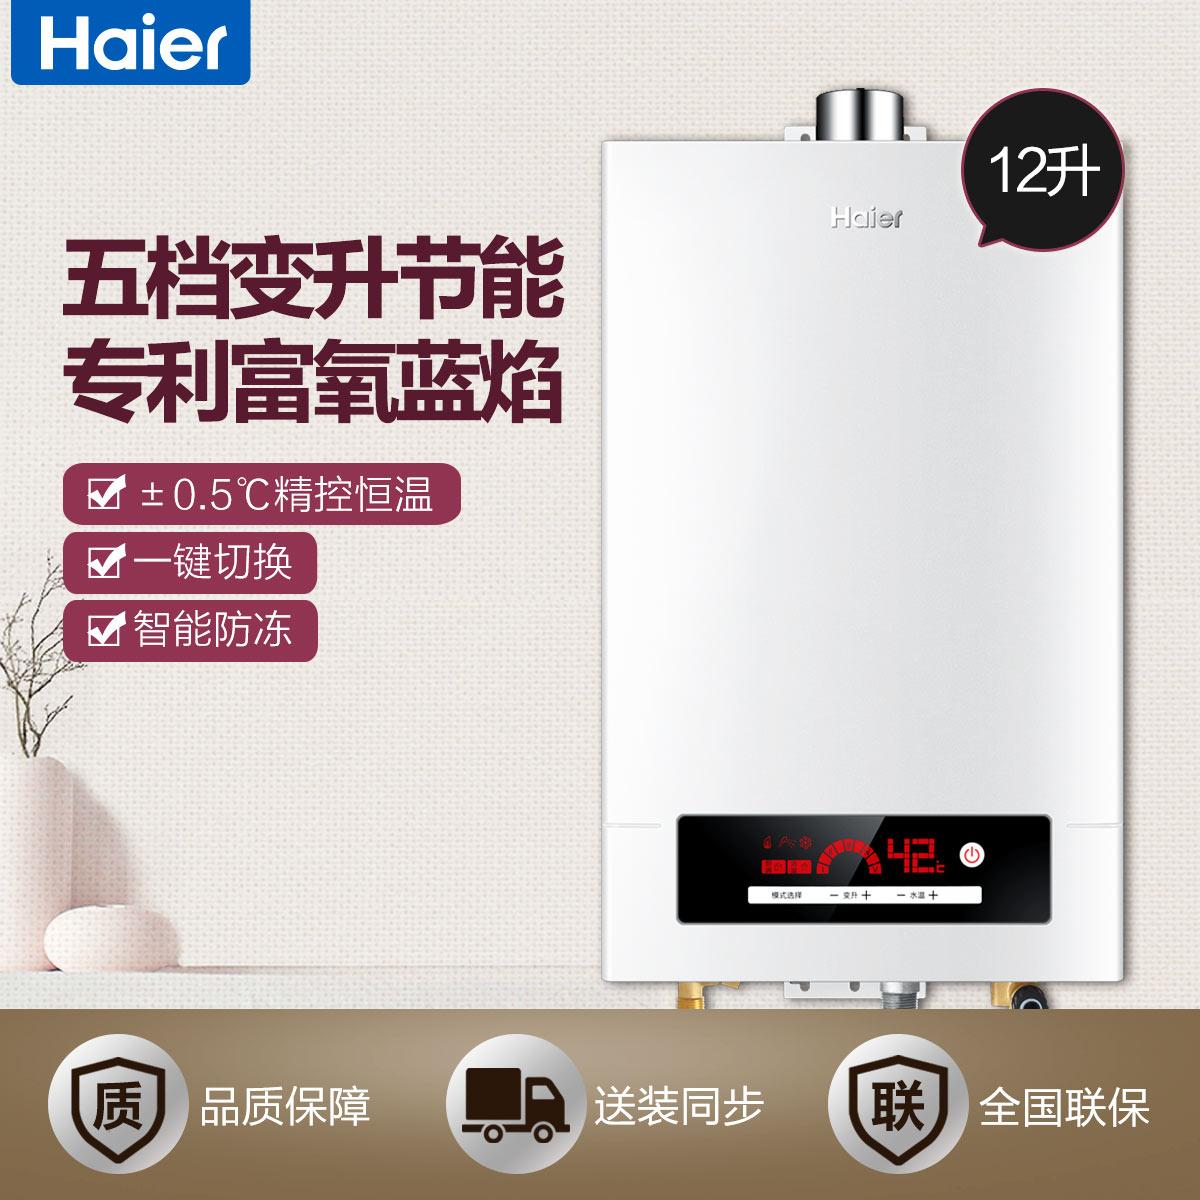 Haier/海尔 燃气热水器 JSQ24-12TC2(12T)(珠光)